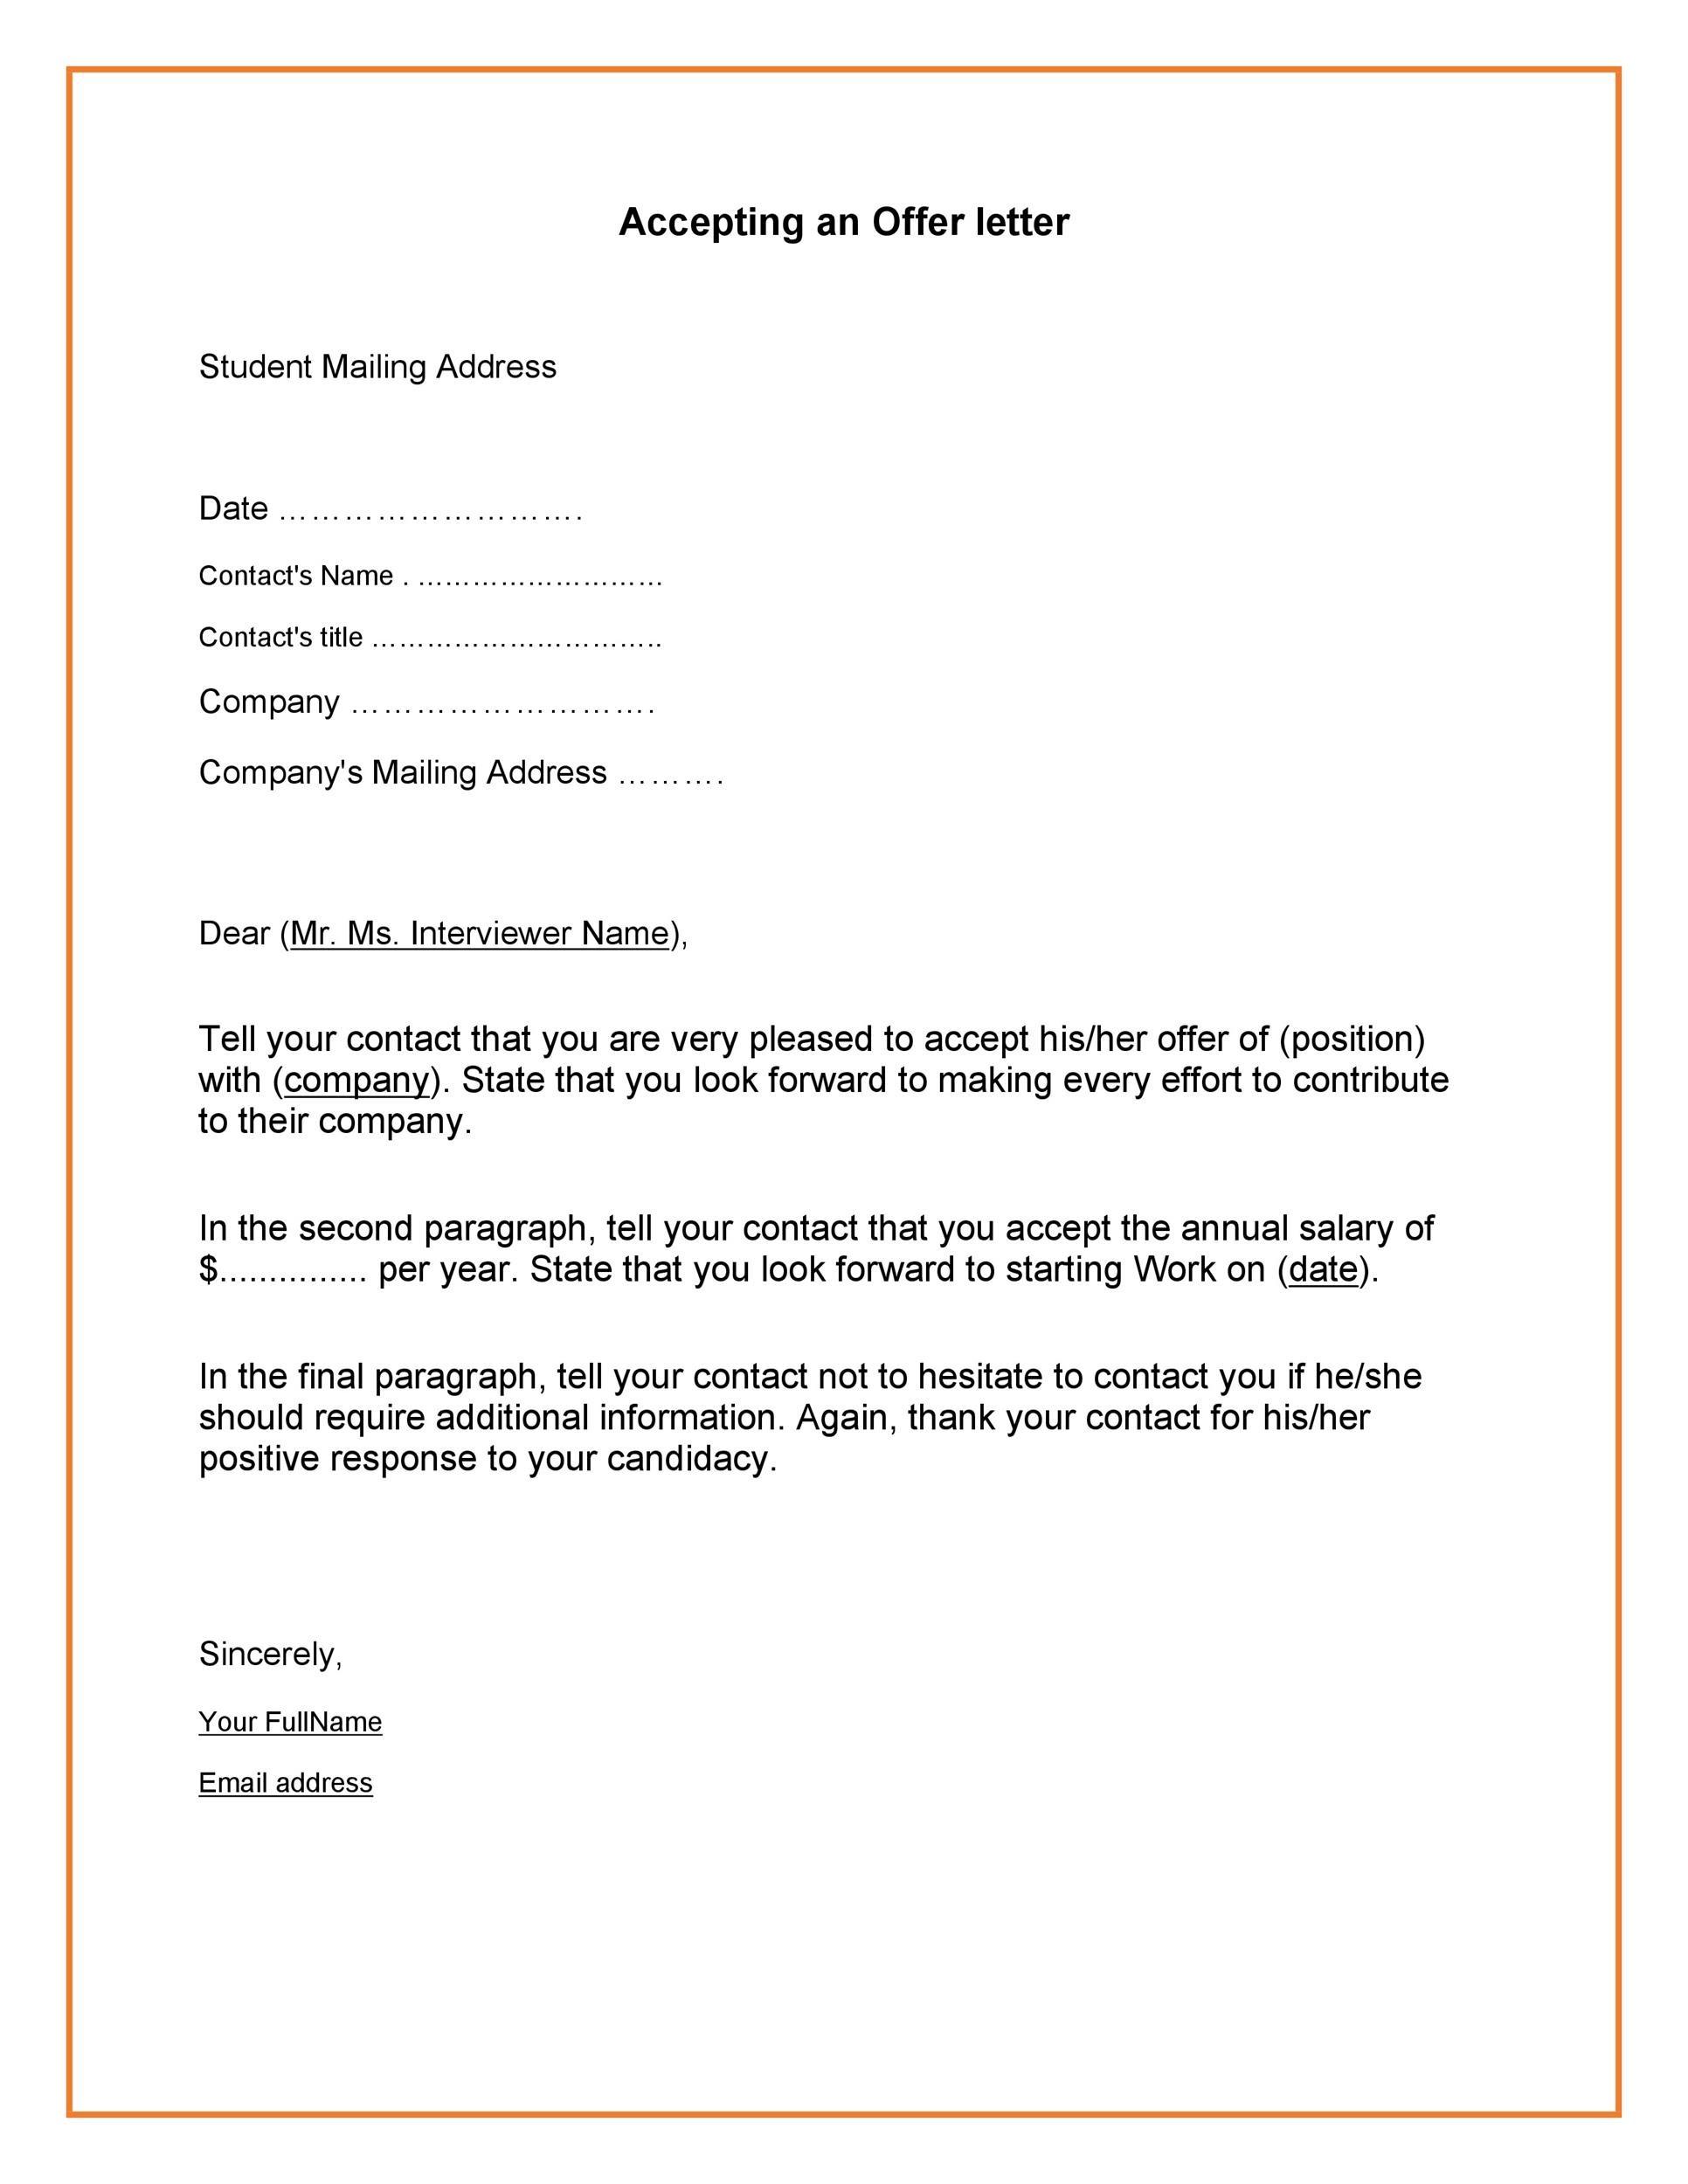 Free job acceptance letter 34